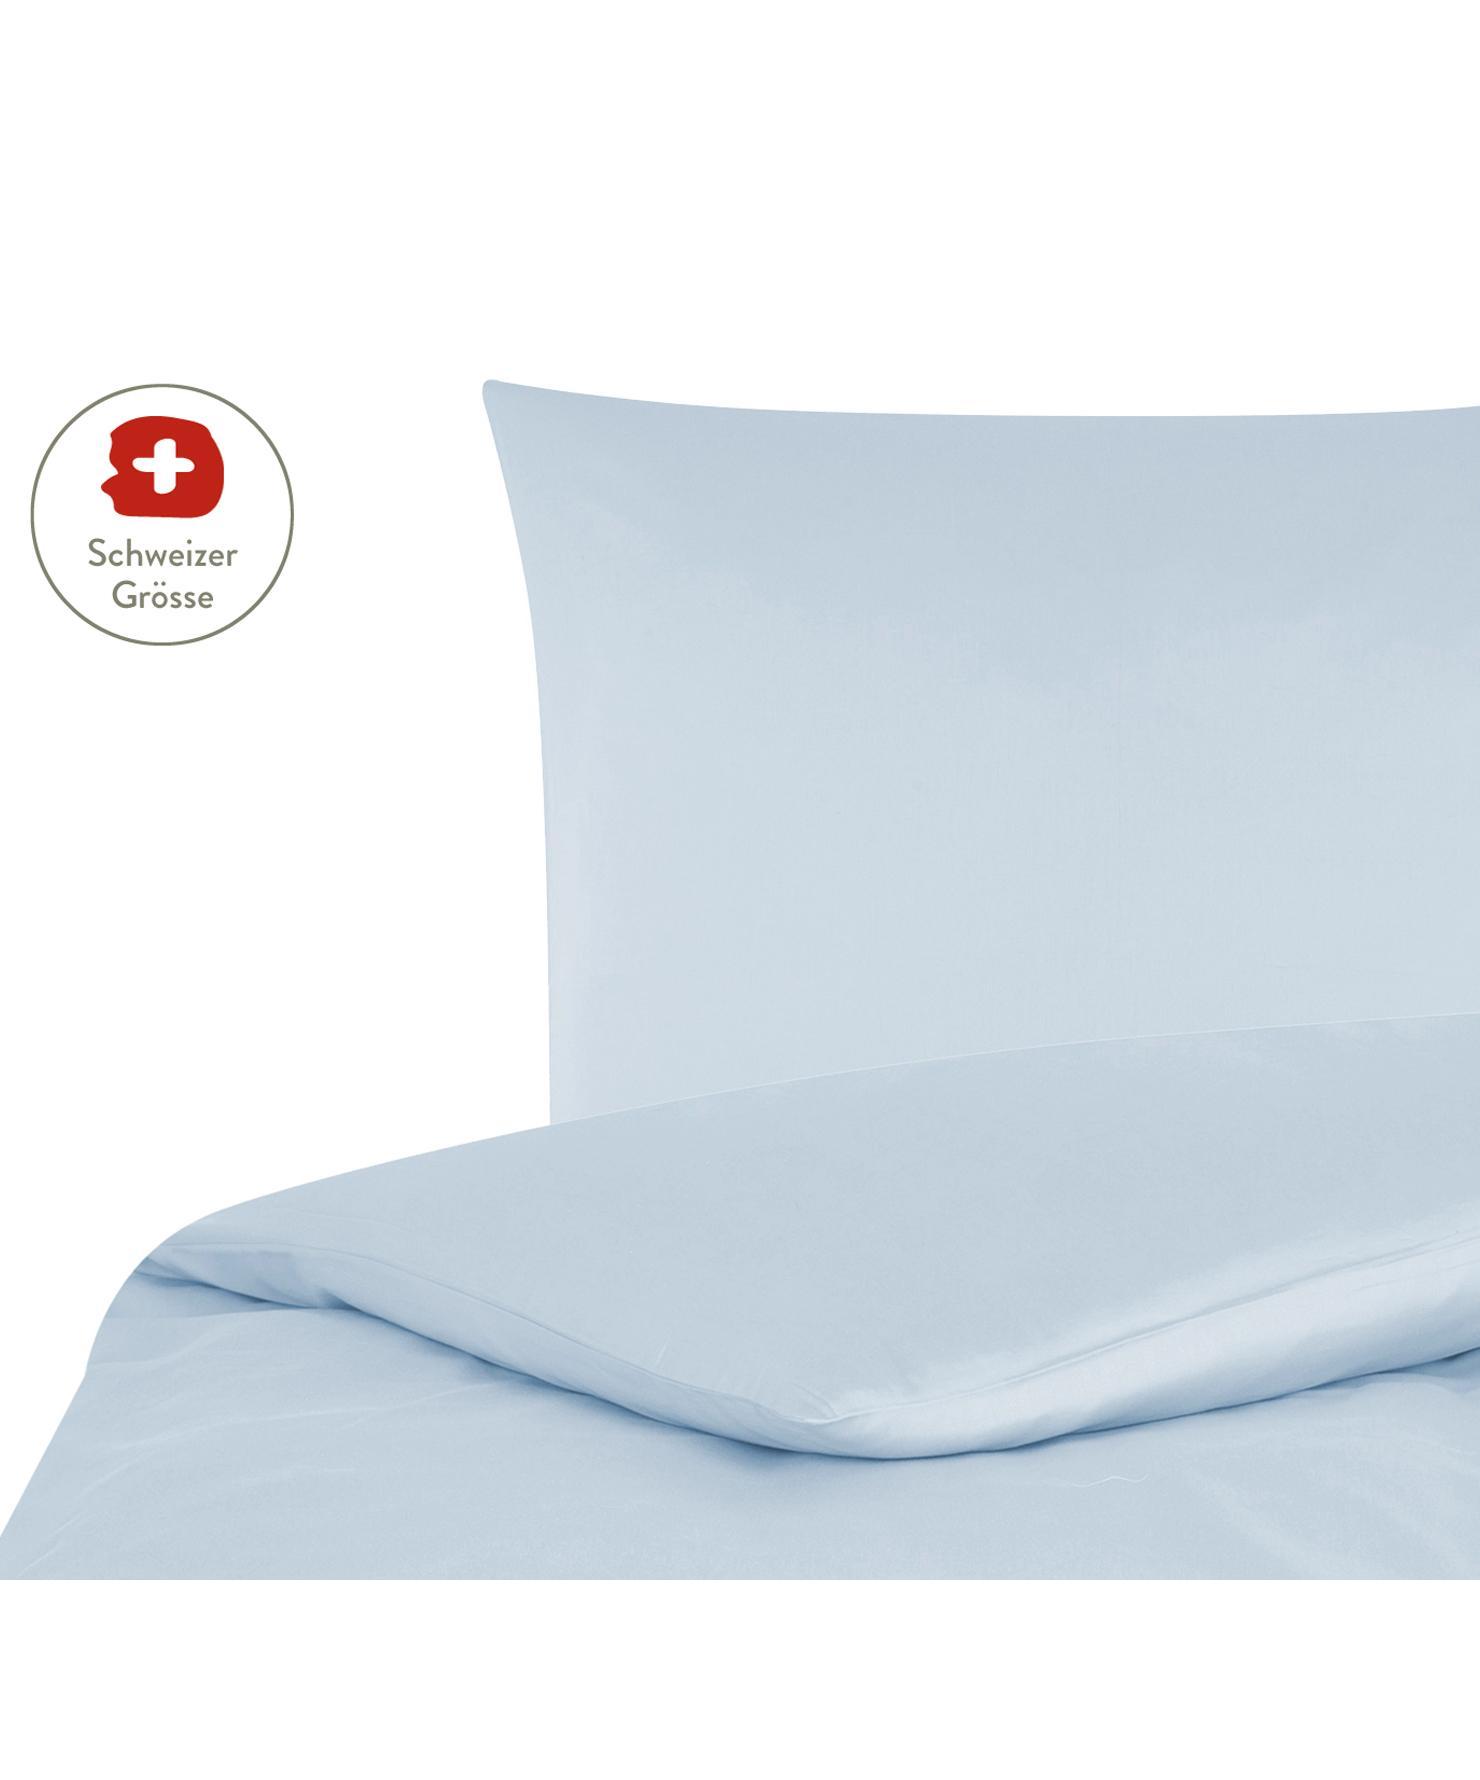 Baumwollsatin-Bettdeckenbezug Comfort in Hellblau, Webart: Satin, leicht glänzend Fa, Hellblau, 160 x 210 cm